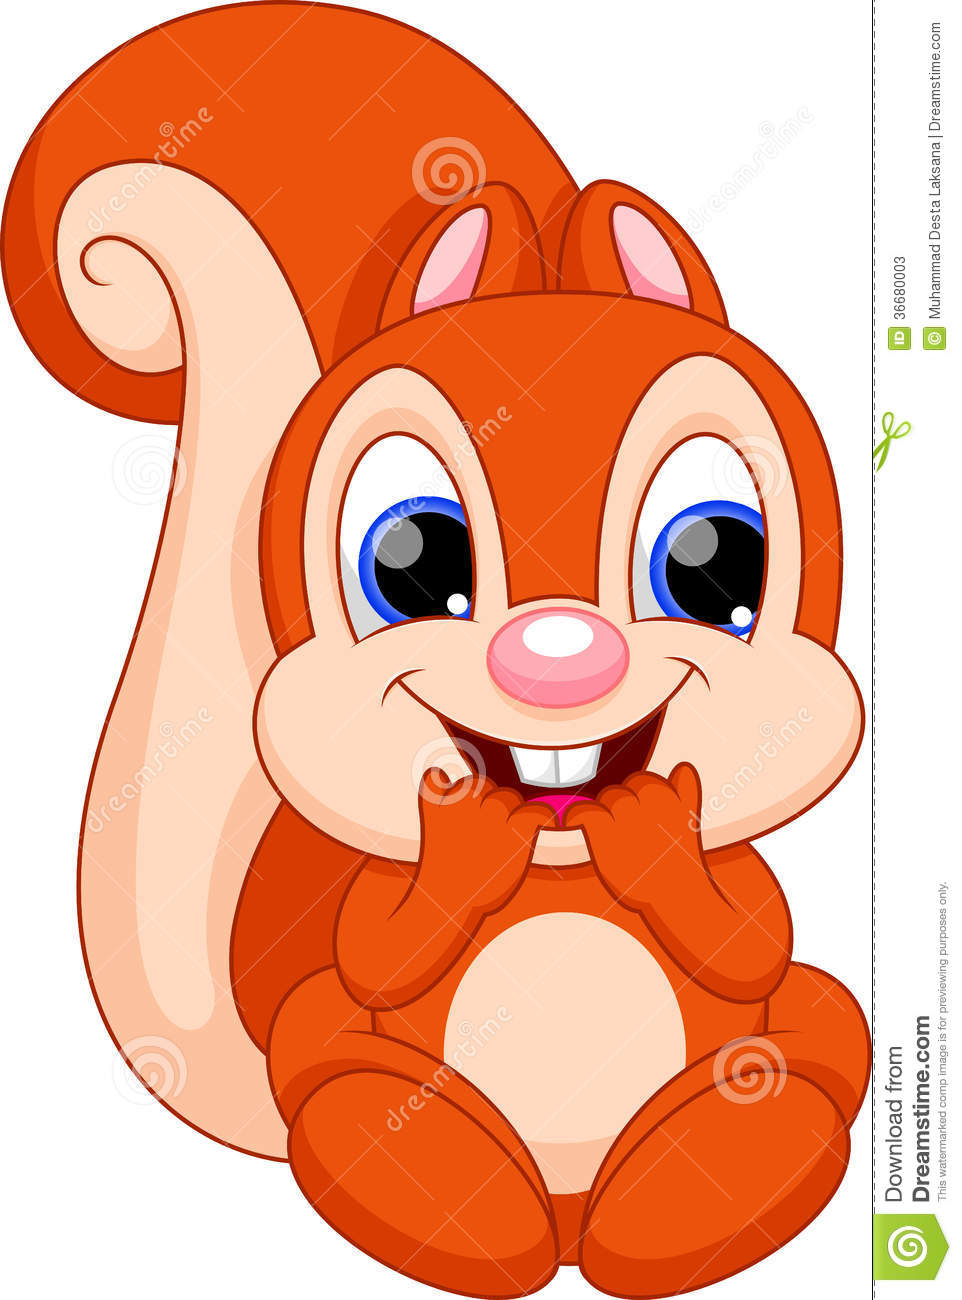 Cute baby squirrel cartoon stock illustration. Illustration of cute.